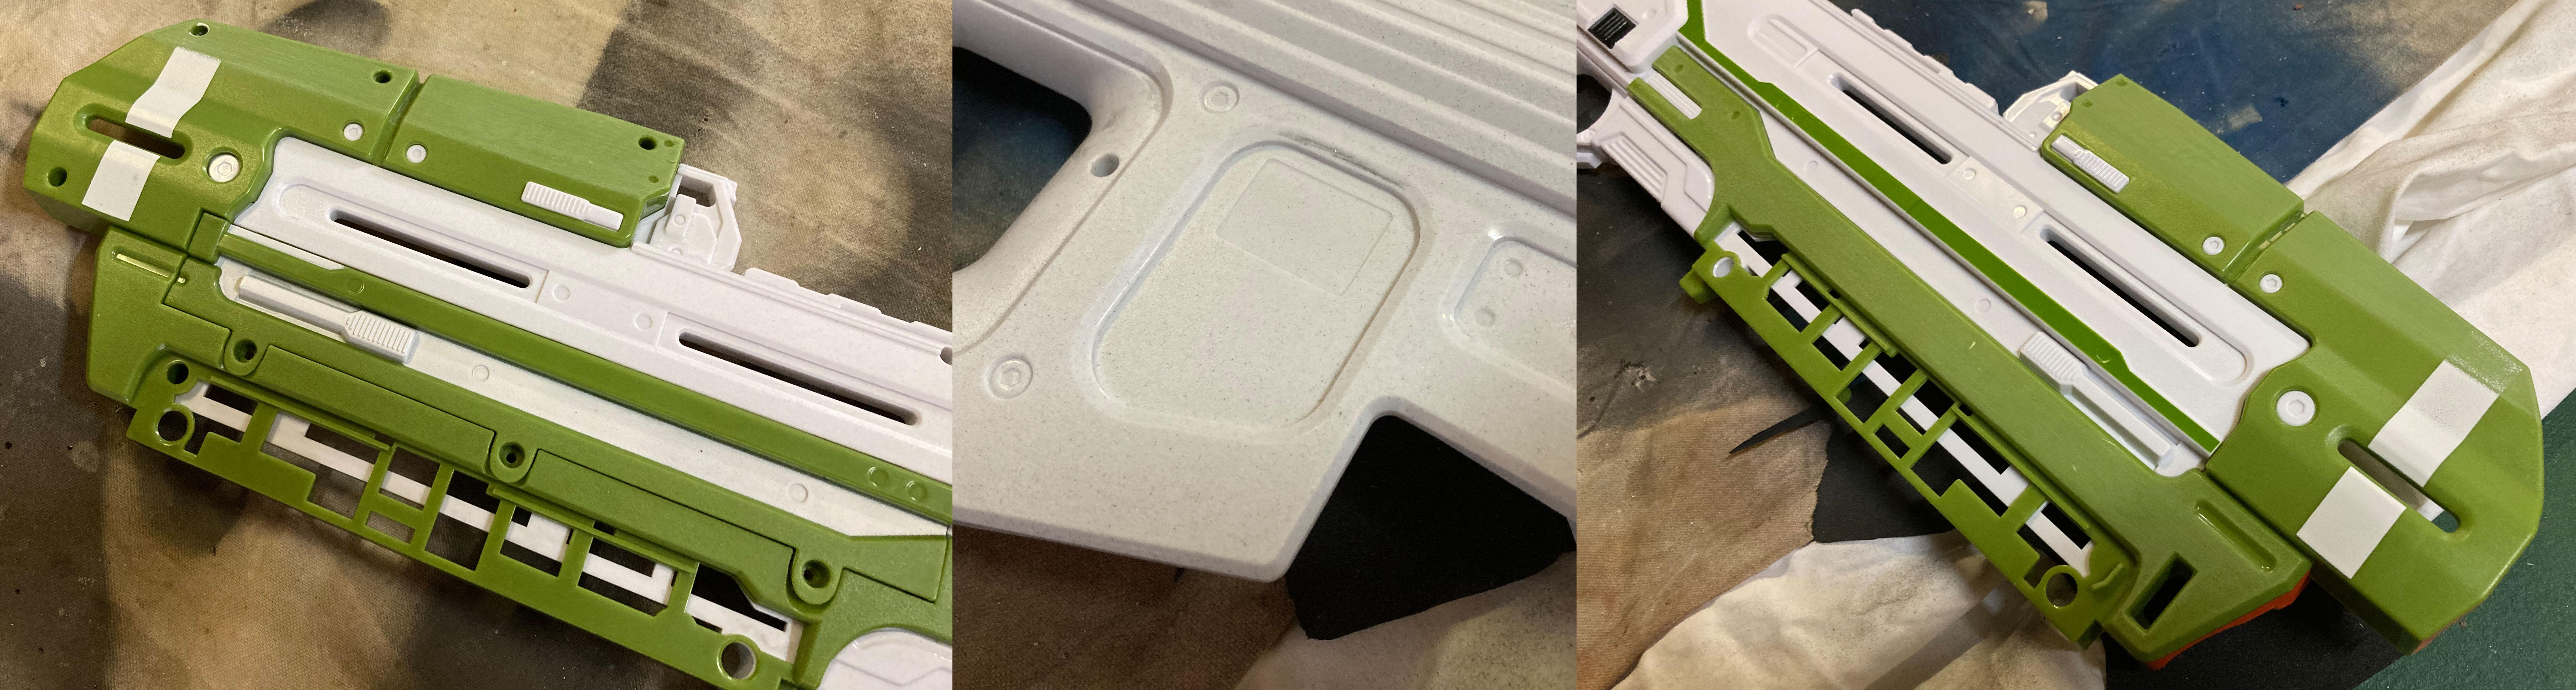 (1c) Nerf MA40 Assault Rifle Sanding .jpg